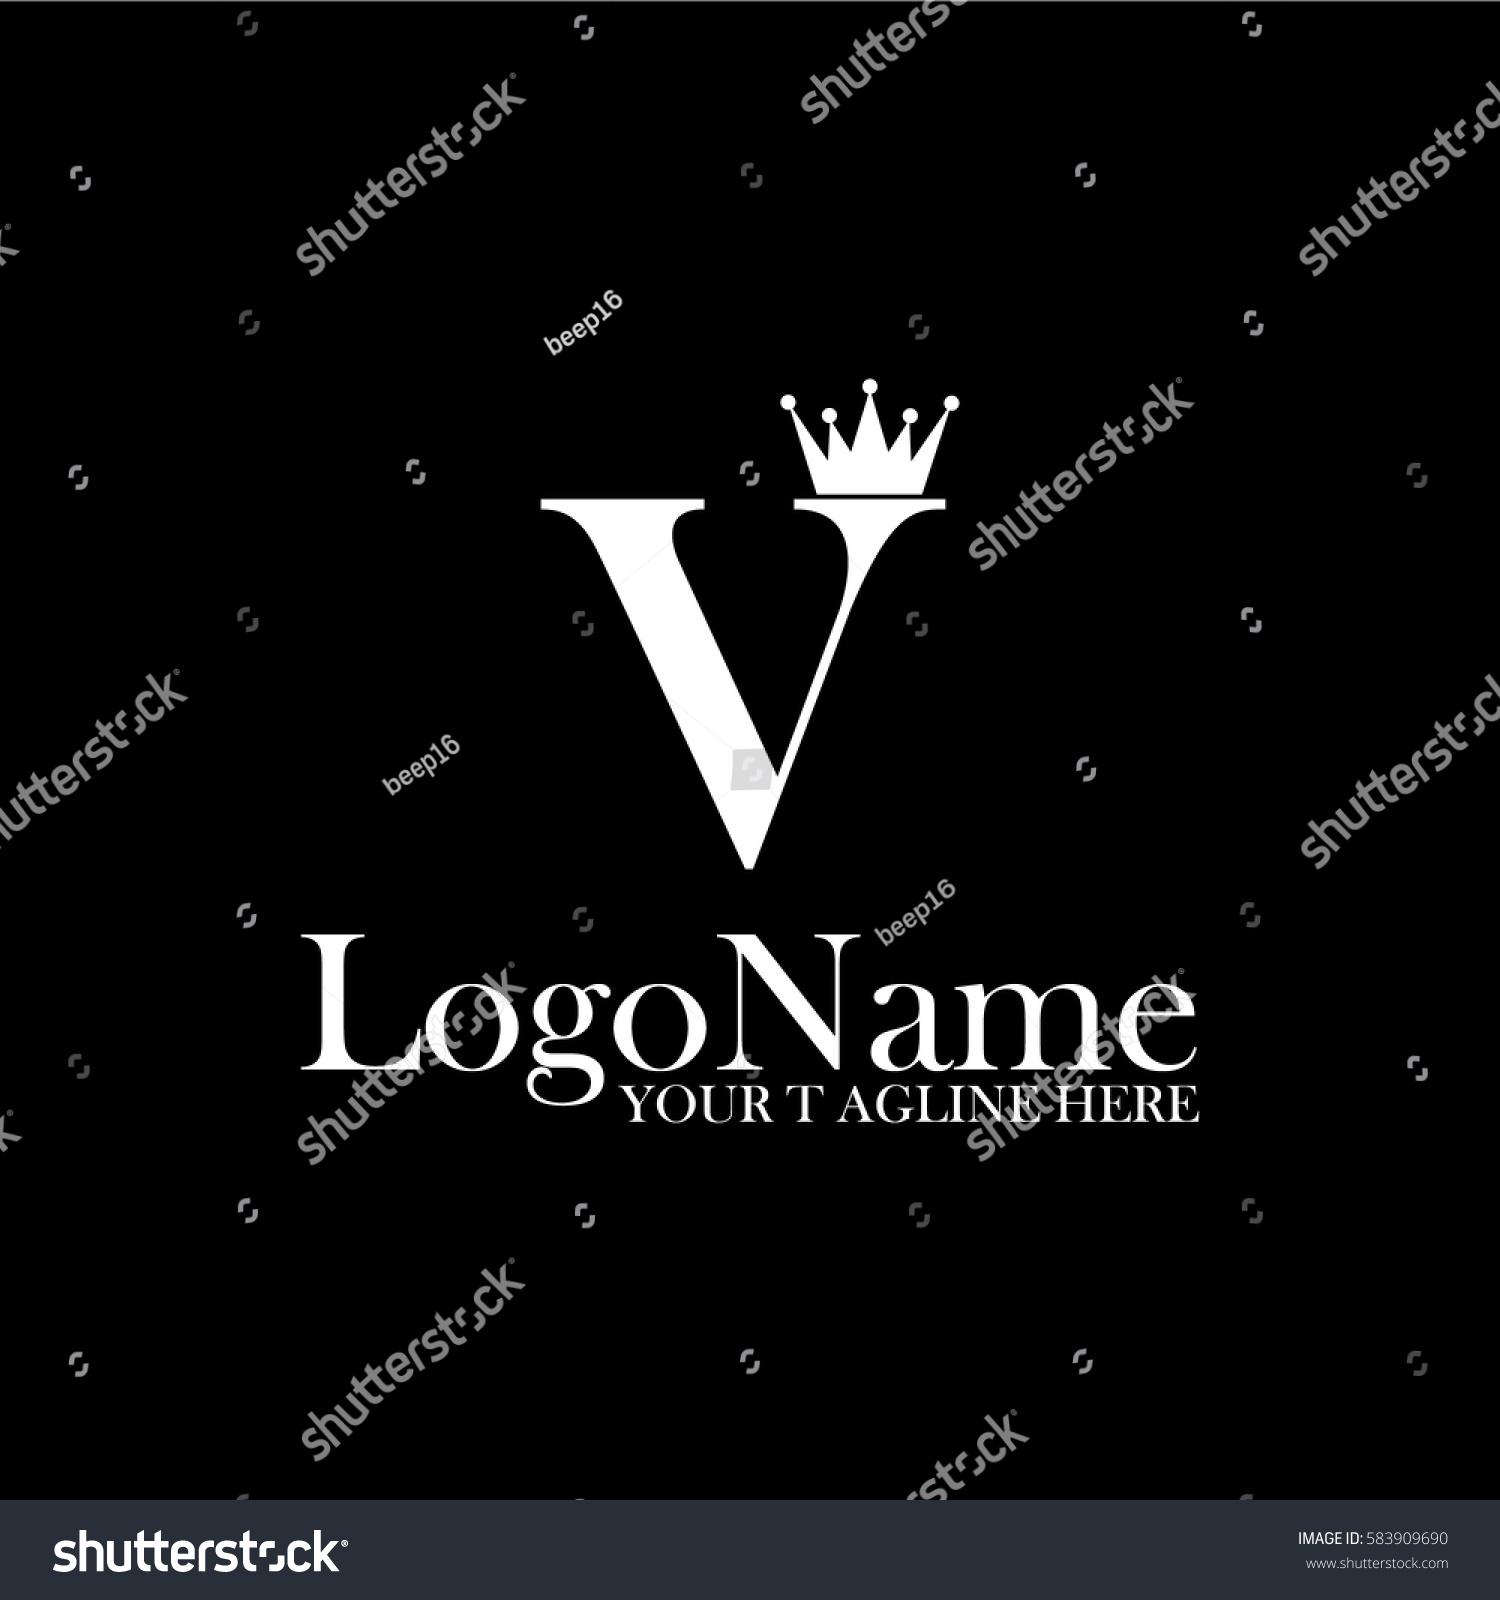 Tj initial luxury ornament monogram logo stock vector - Similar Images To Crown Logo Stock Vector